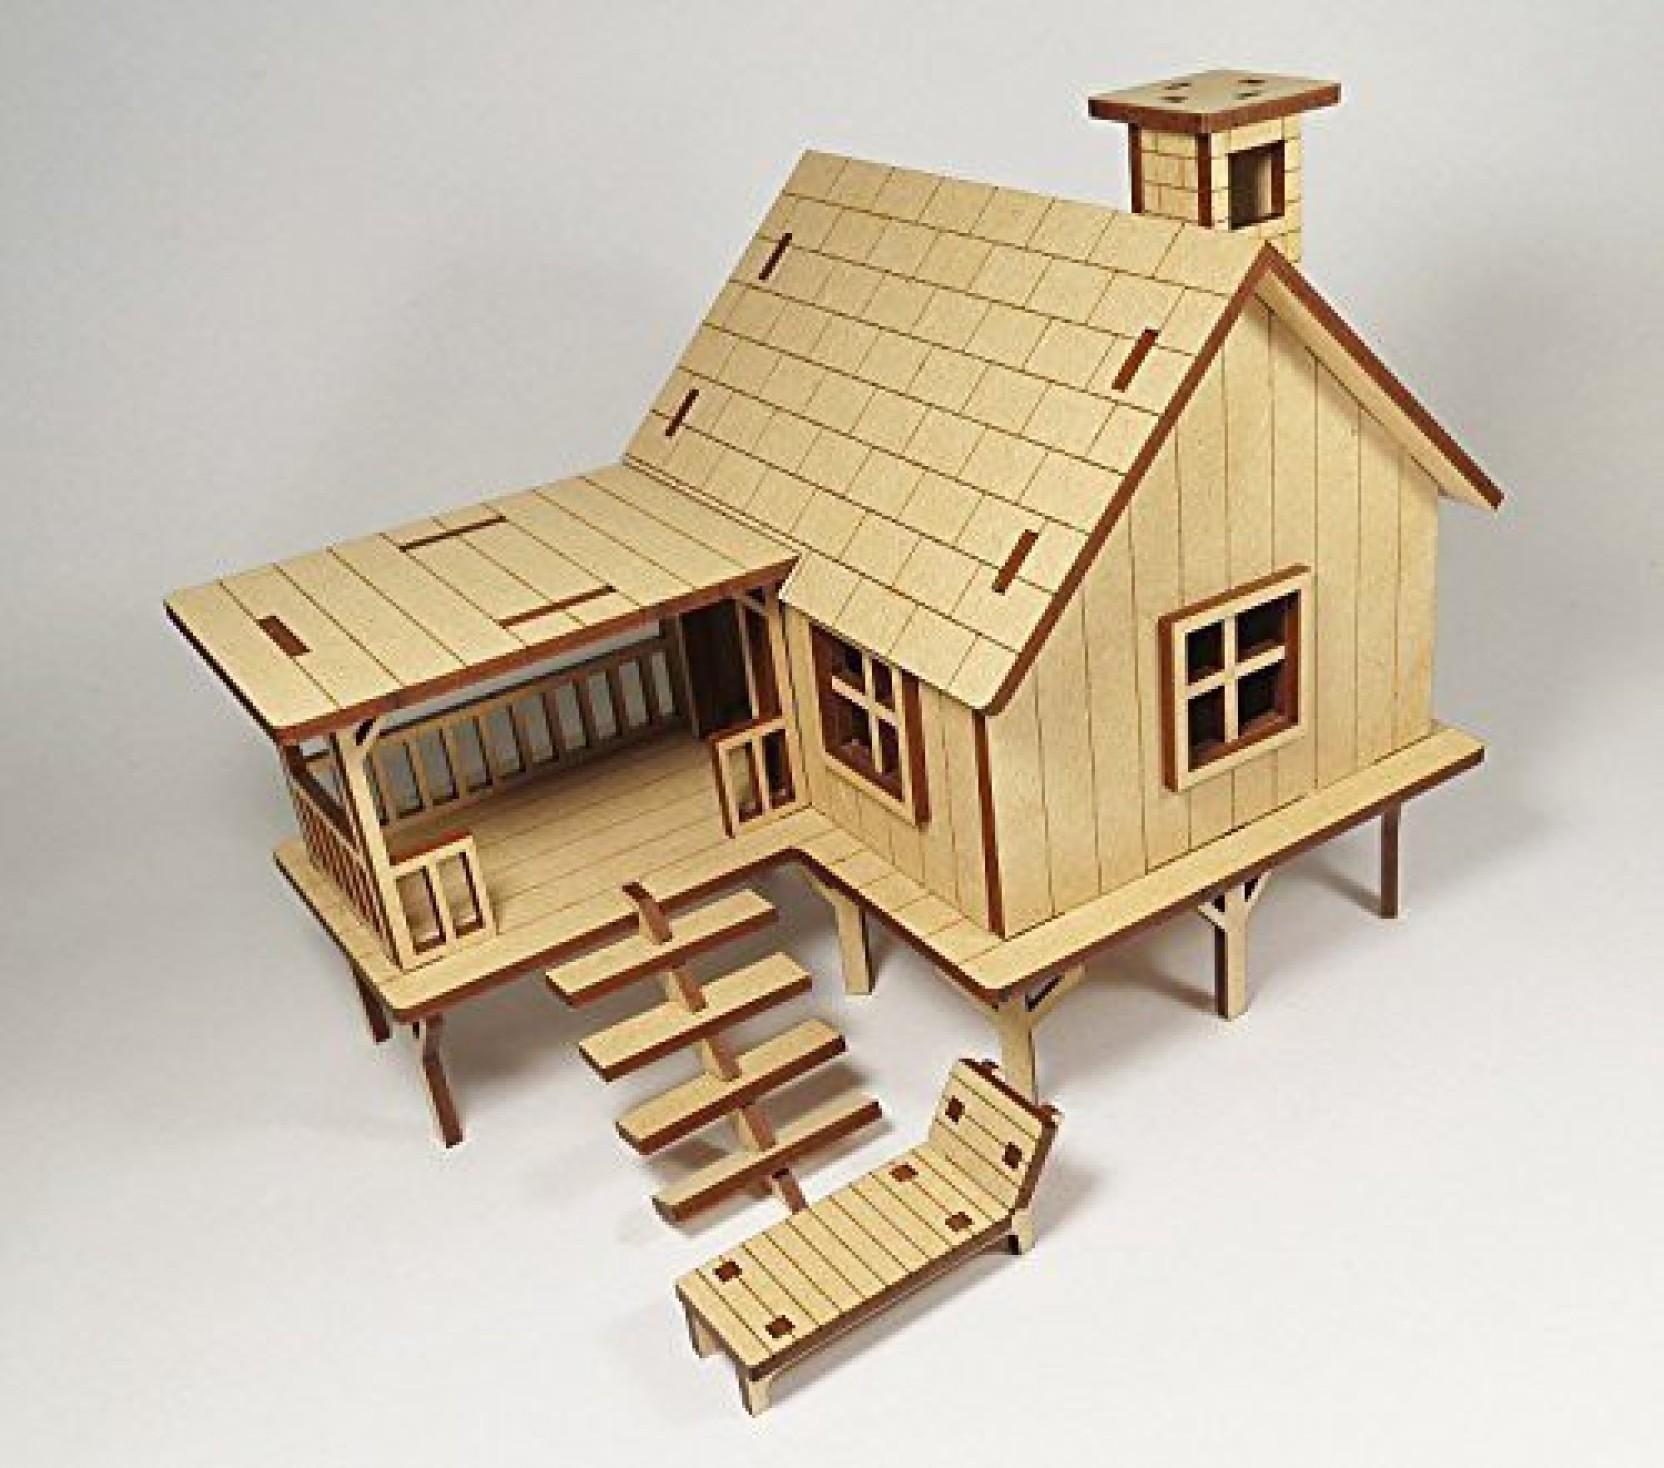 StonKraft Wooden 3D Puzzle Beach House - Home Decor